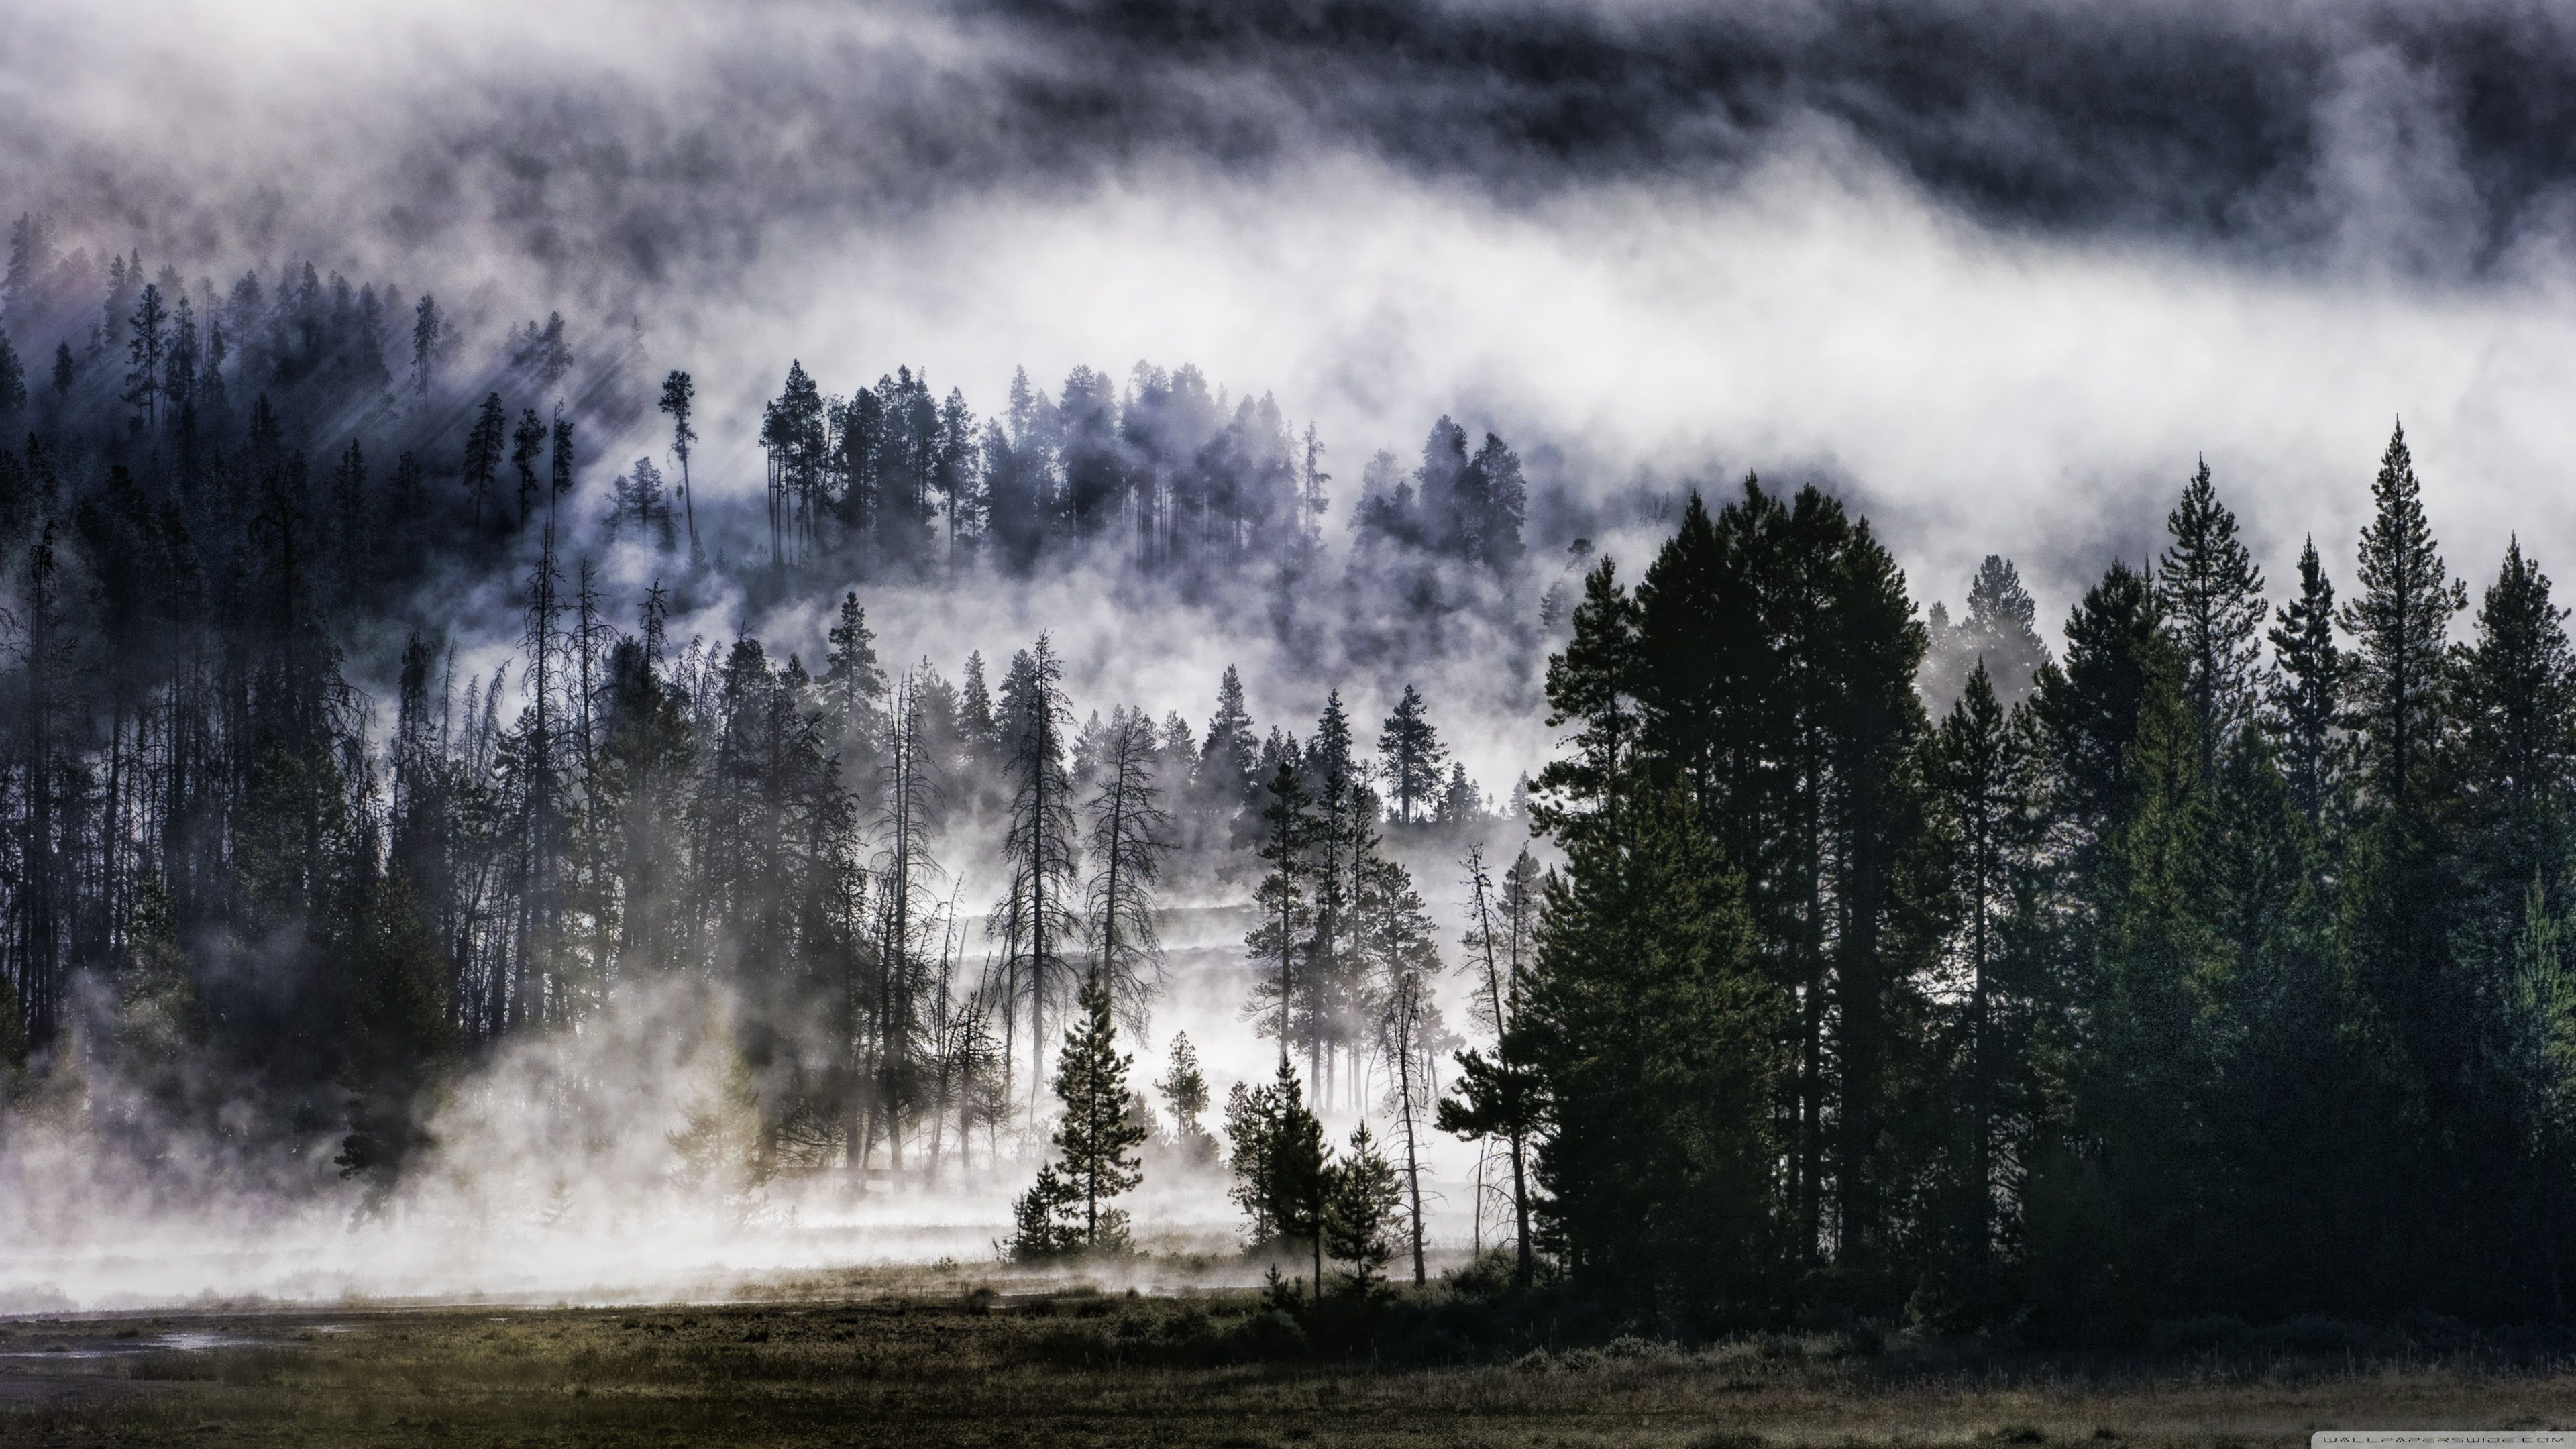 Foggy Ultra Hd Landscape Wallpapers Top Free Foggy Ultra